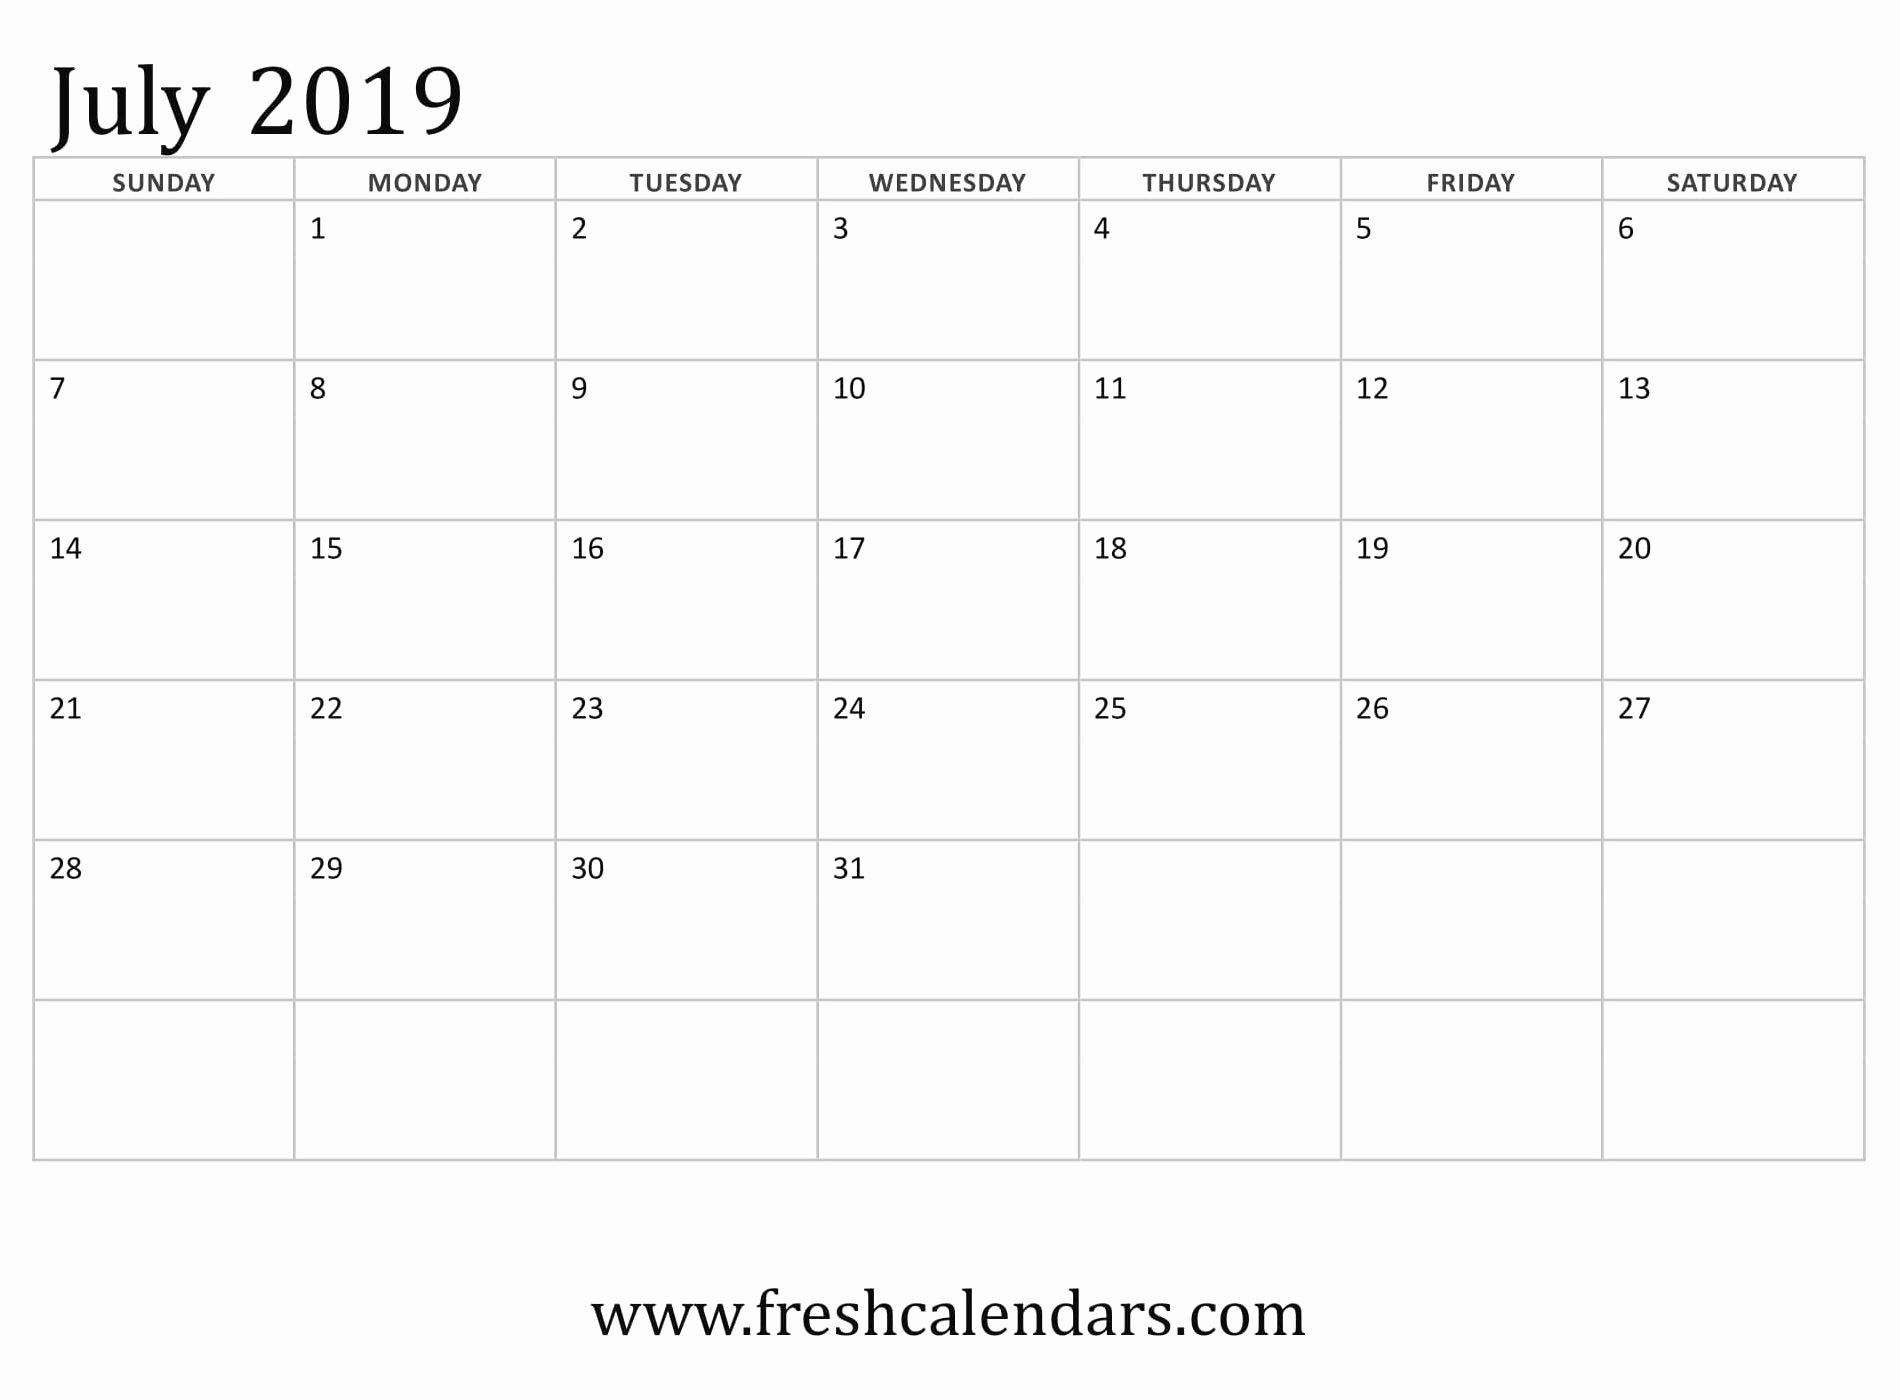 Microsoft Calendar Templates 2019 Awesome July 2019 Calendar Printable Fresh Calendars